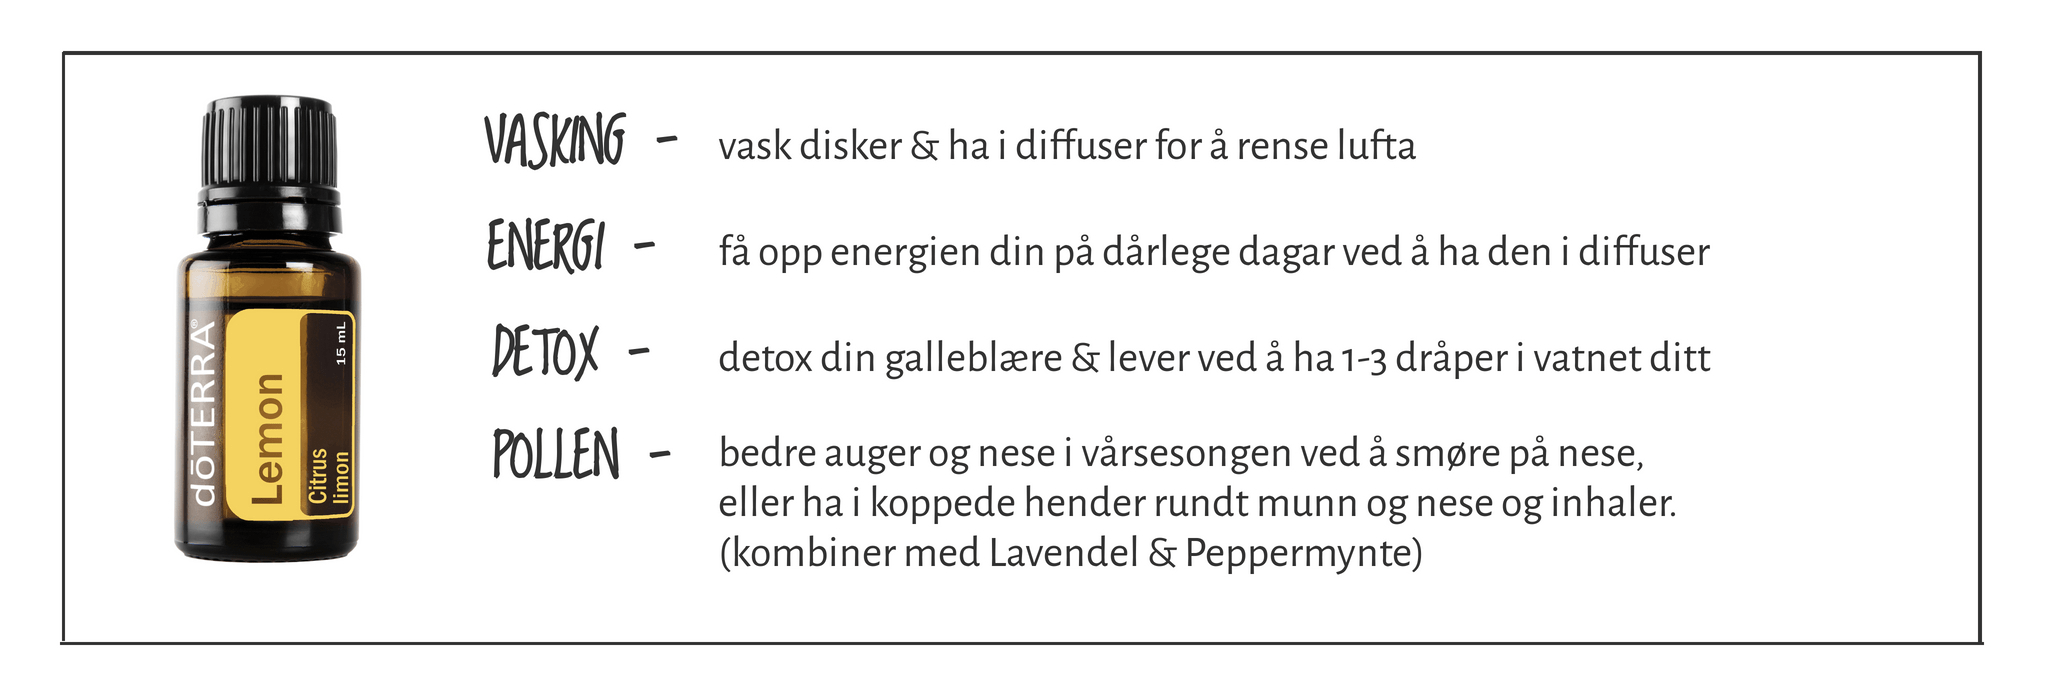 Sitron - lp.faktaboks4